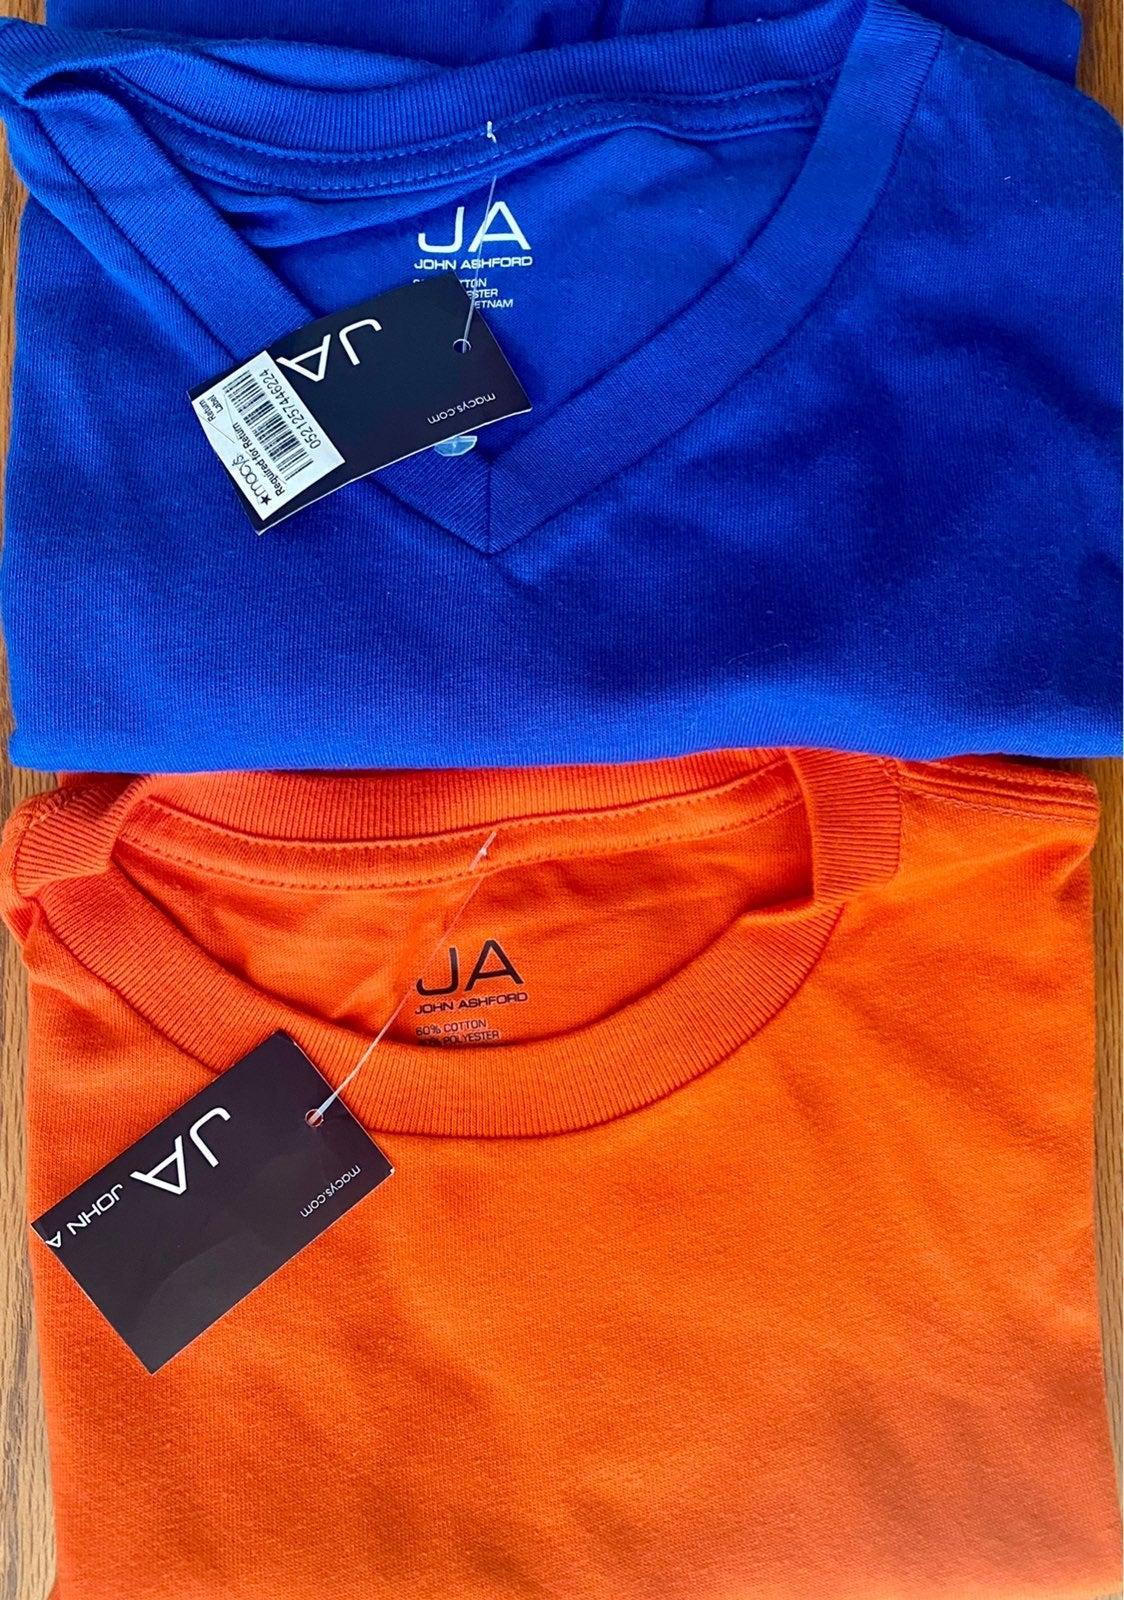 NEW! Lot (2) Men's Orange Blue T-Shirt S